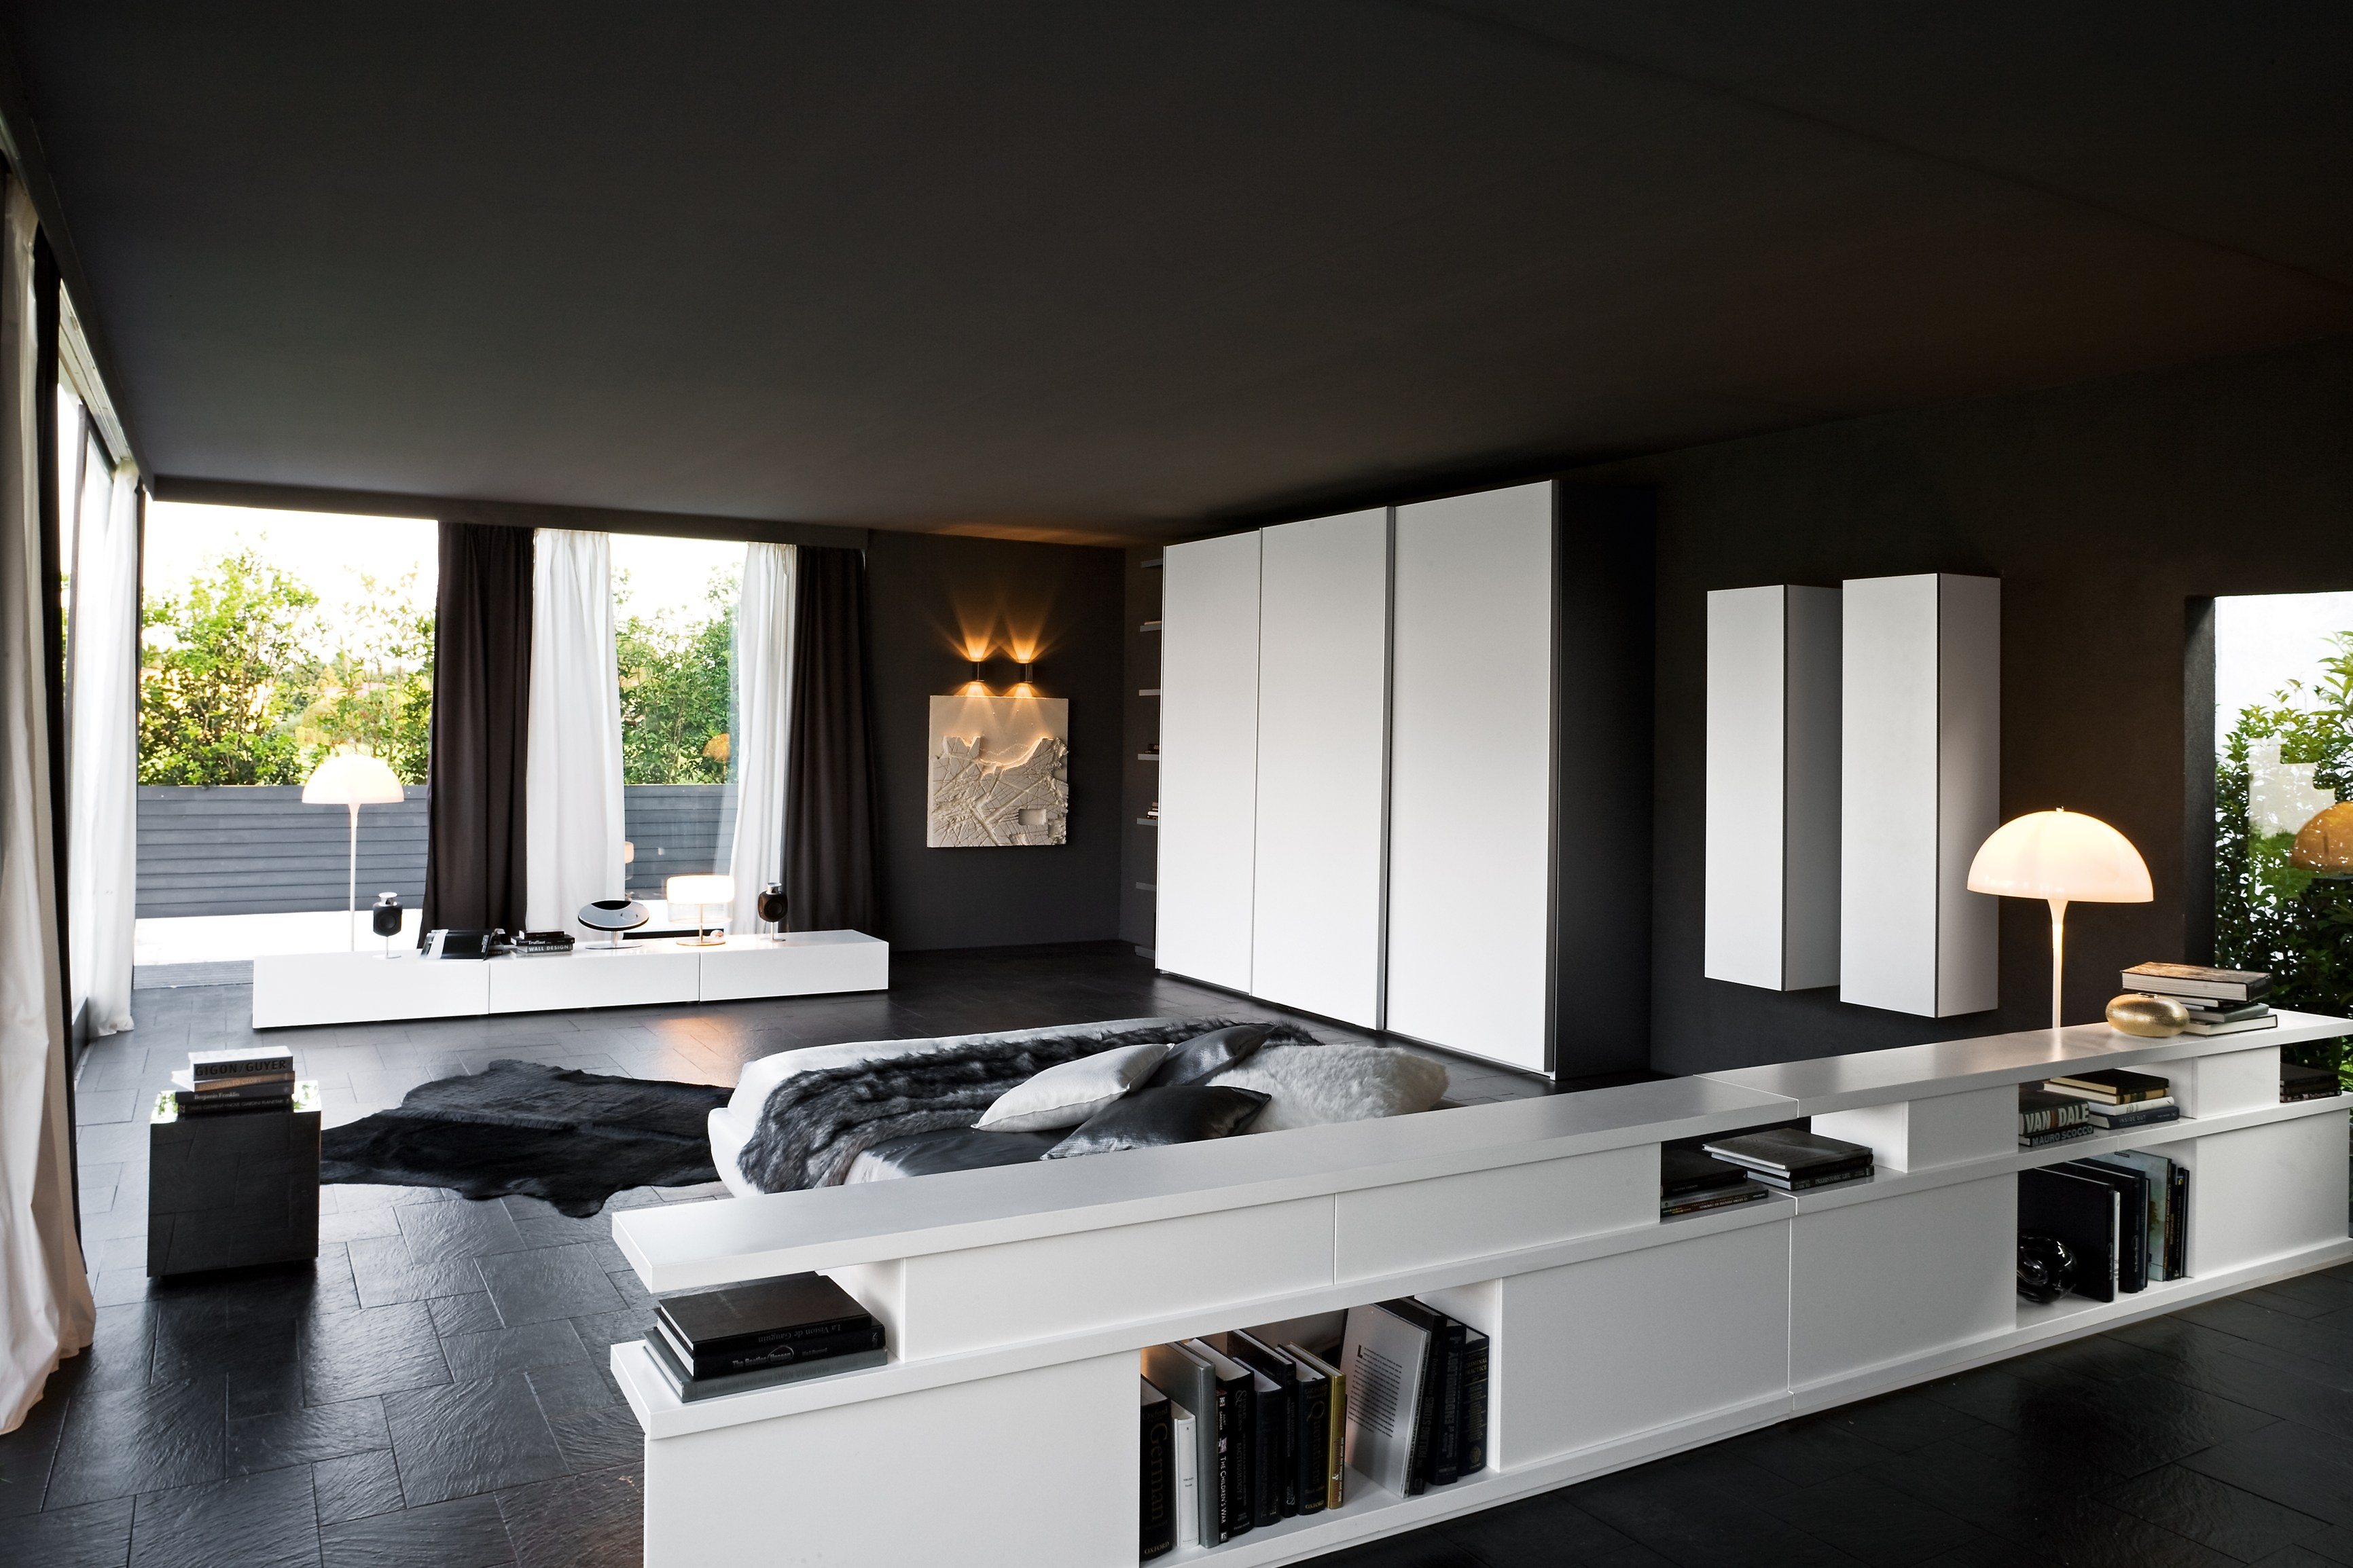 kinderbett stauraum bauen. Black Bedroom Furniture Sets. Home Design Ideas